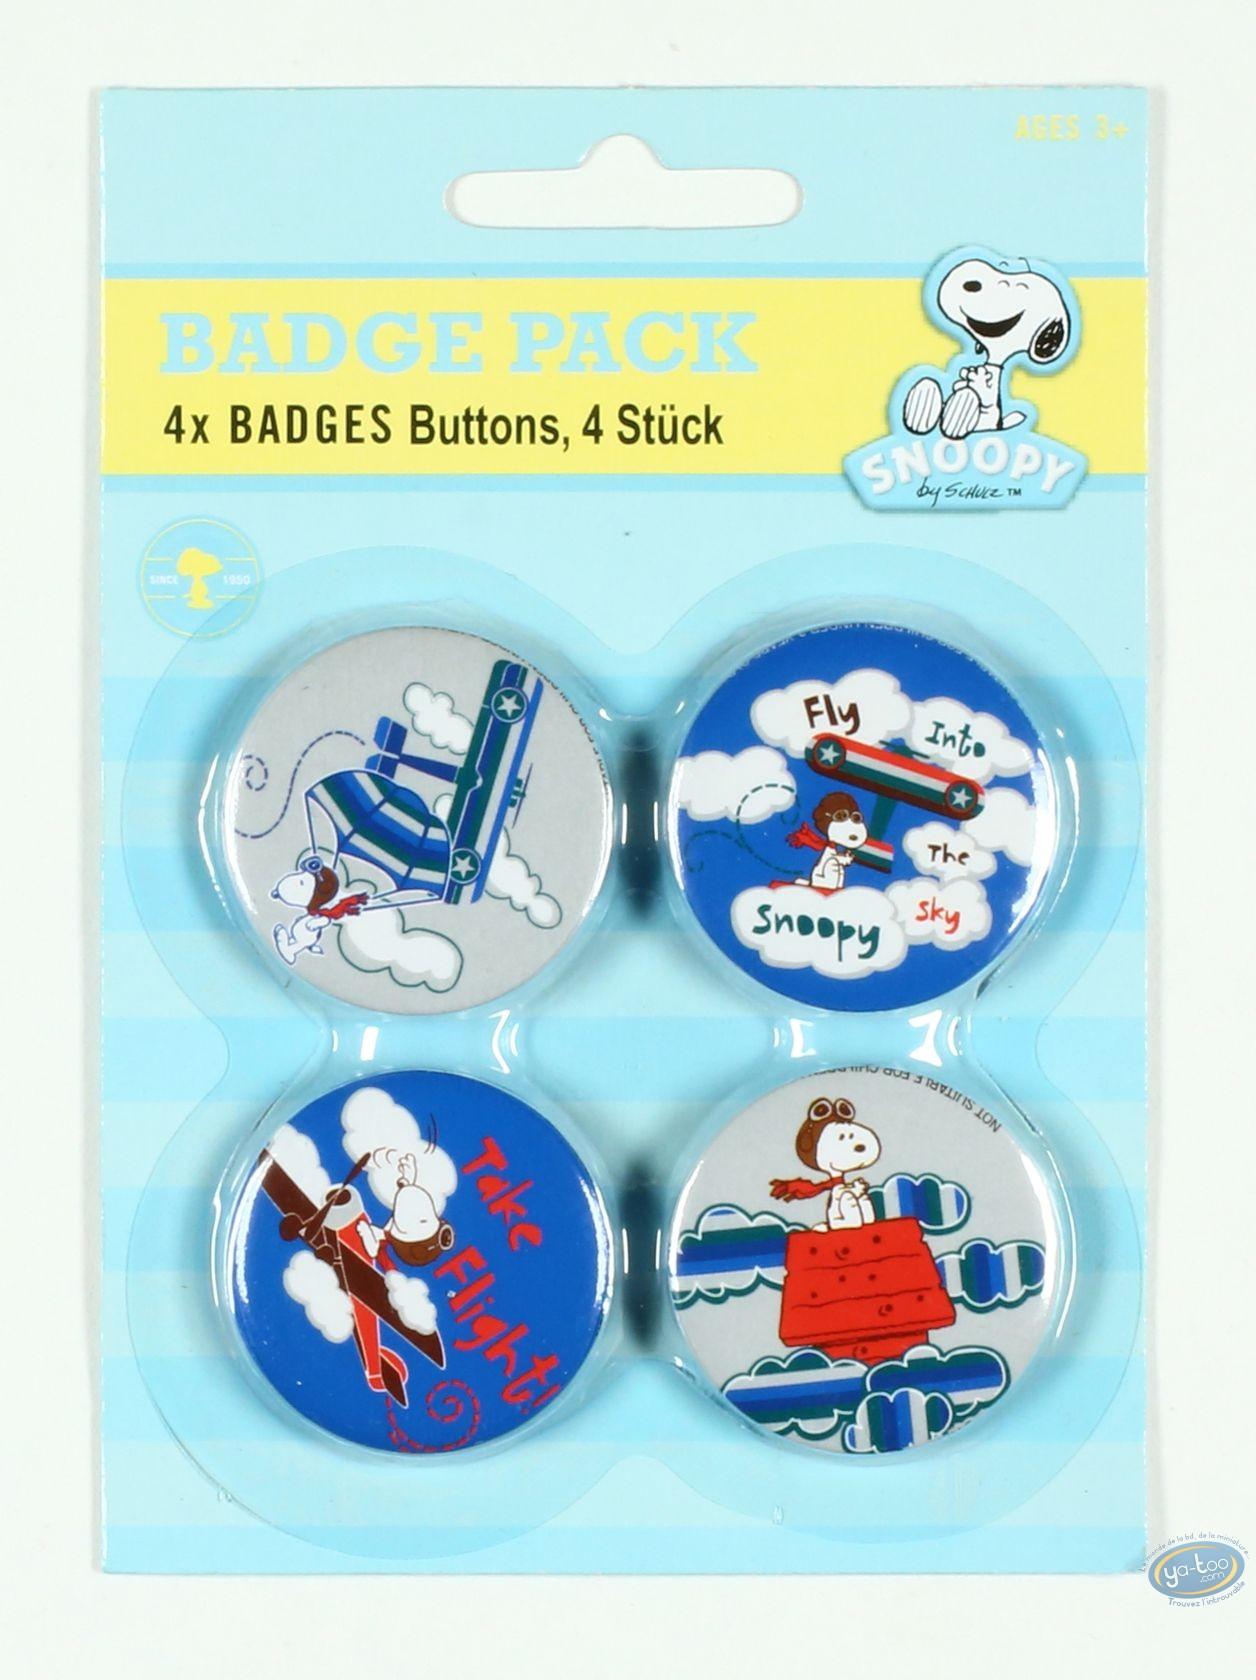 Pin's, Snoopy : 4 badges Snoopy dans les airs (2ème version)